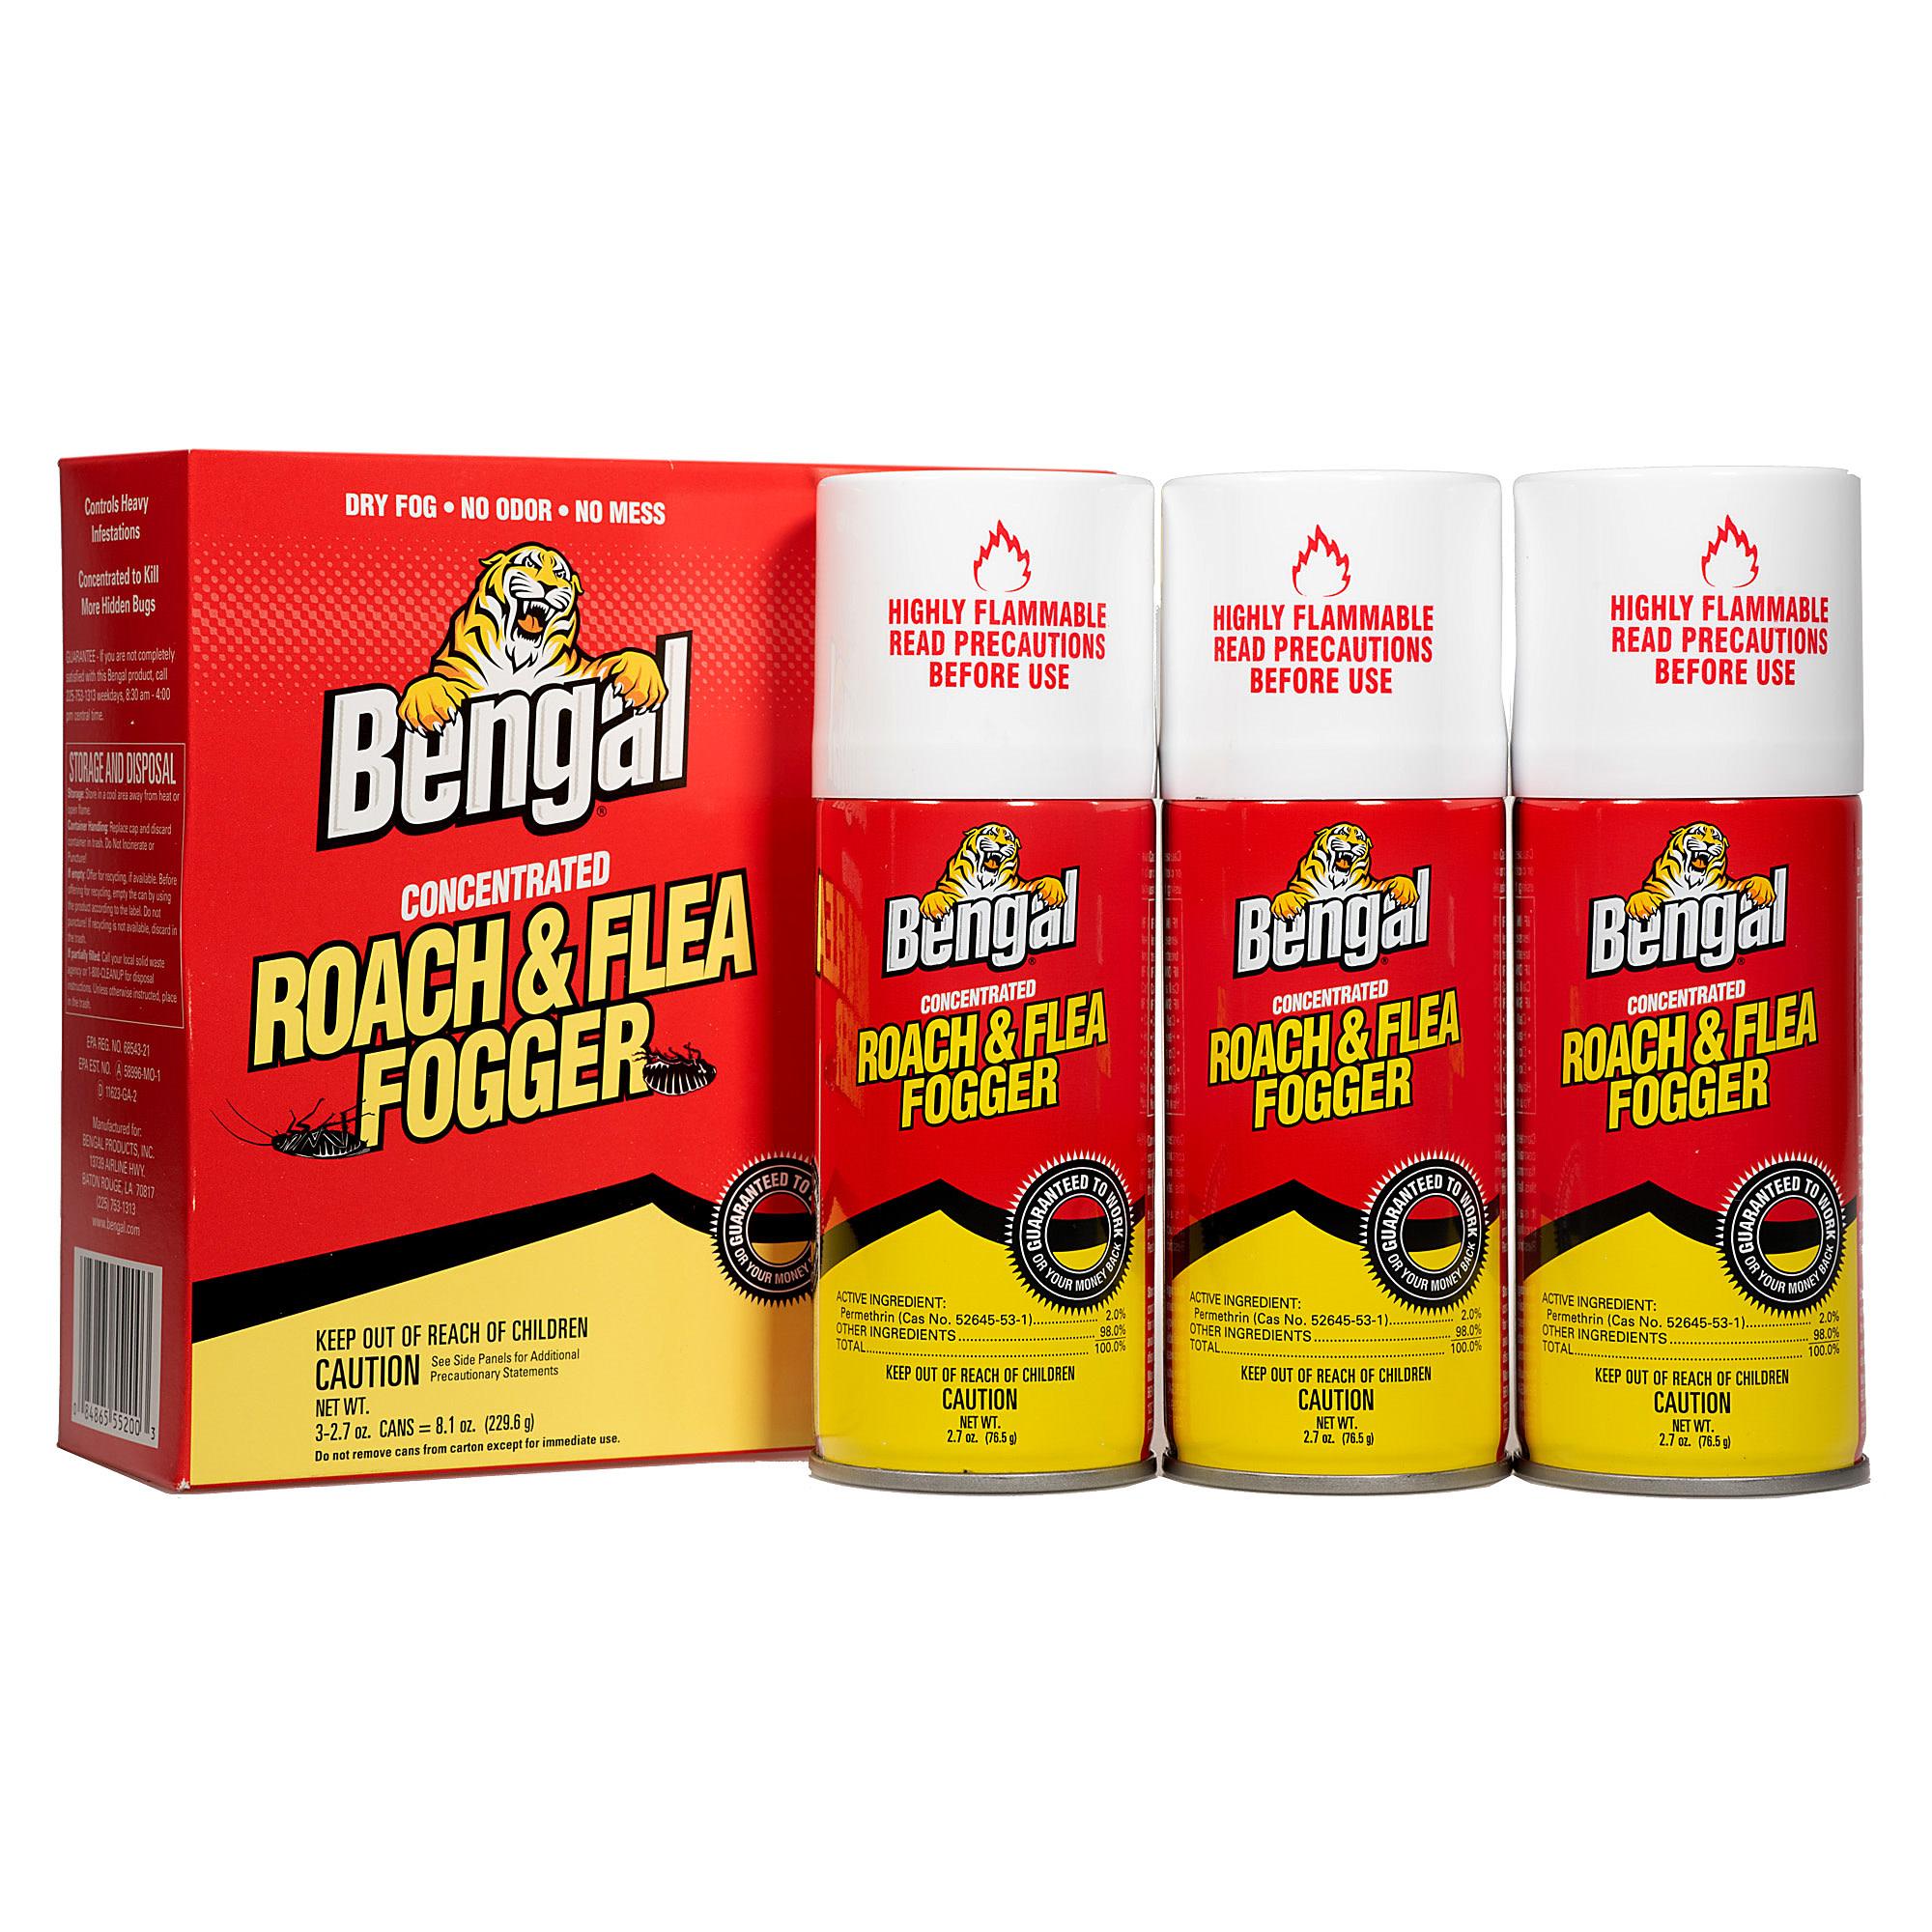 Bengal Bengal Roach & Flea Fogger